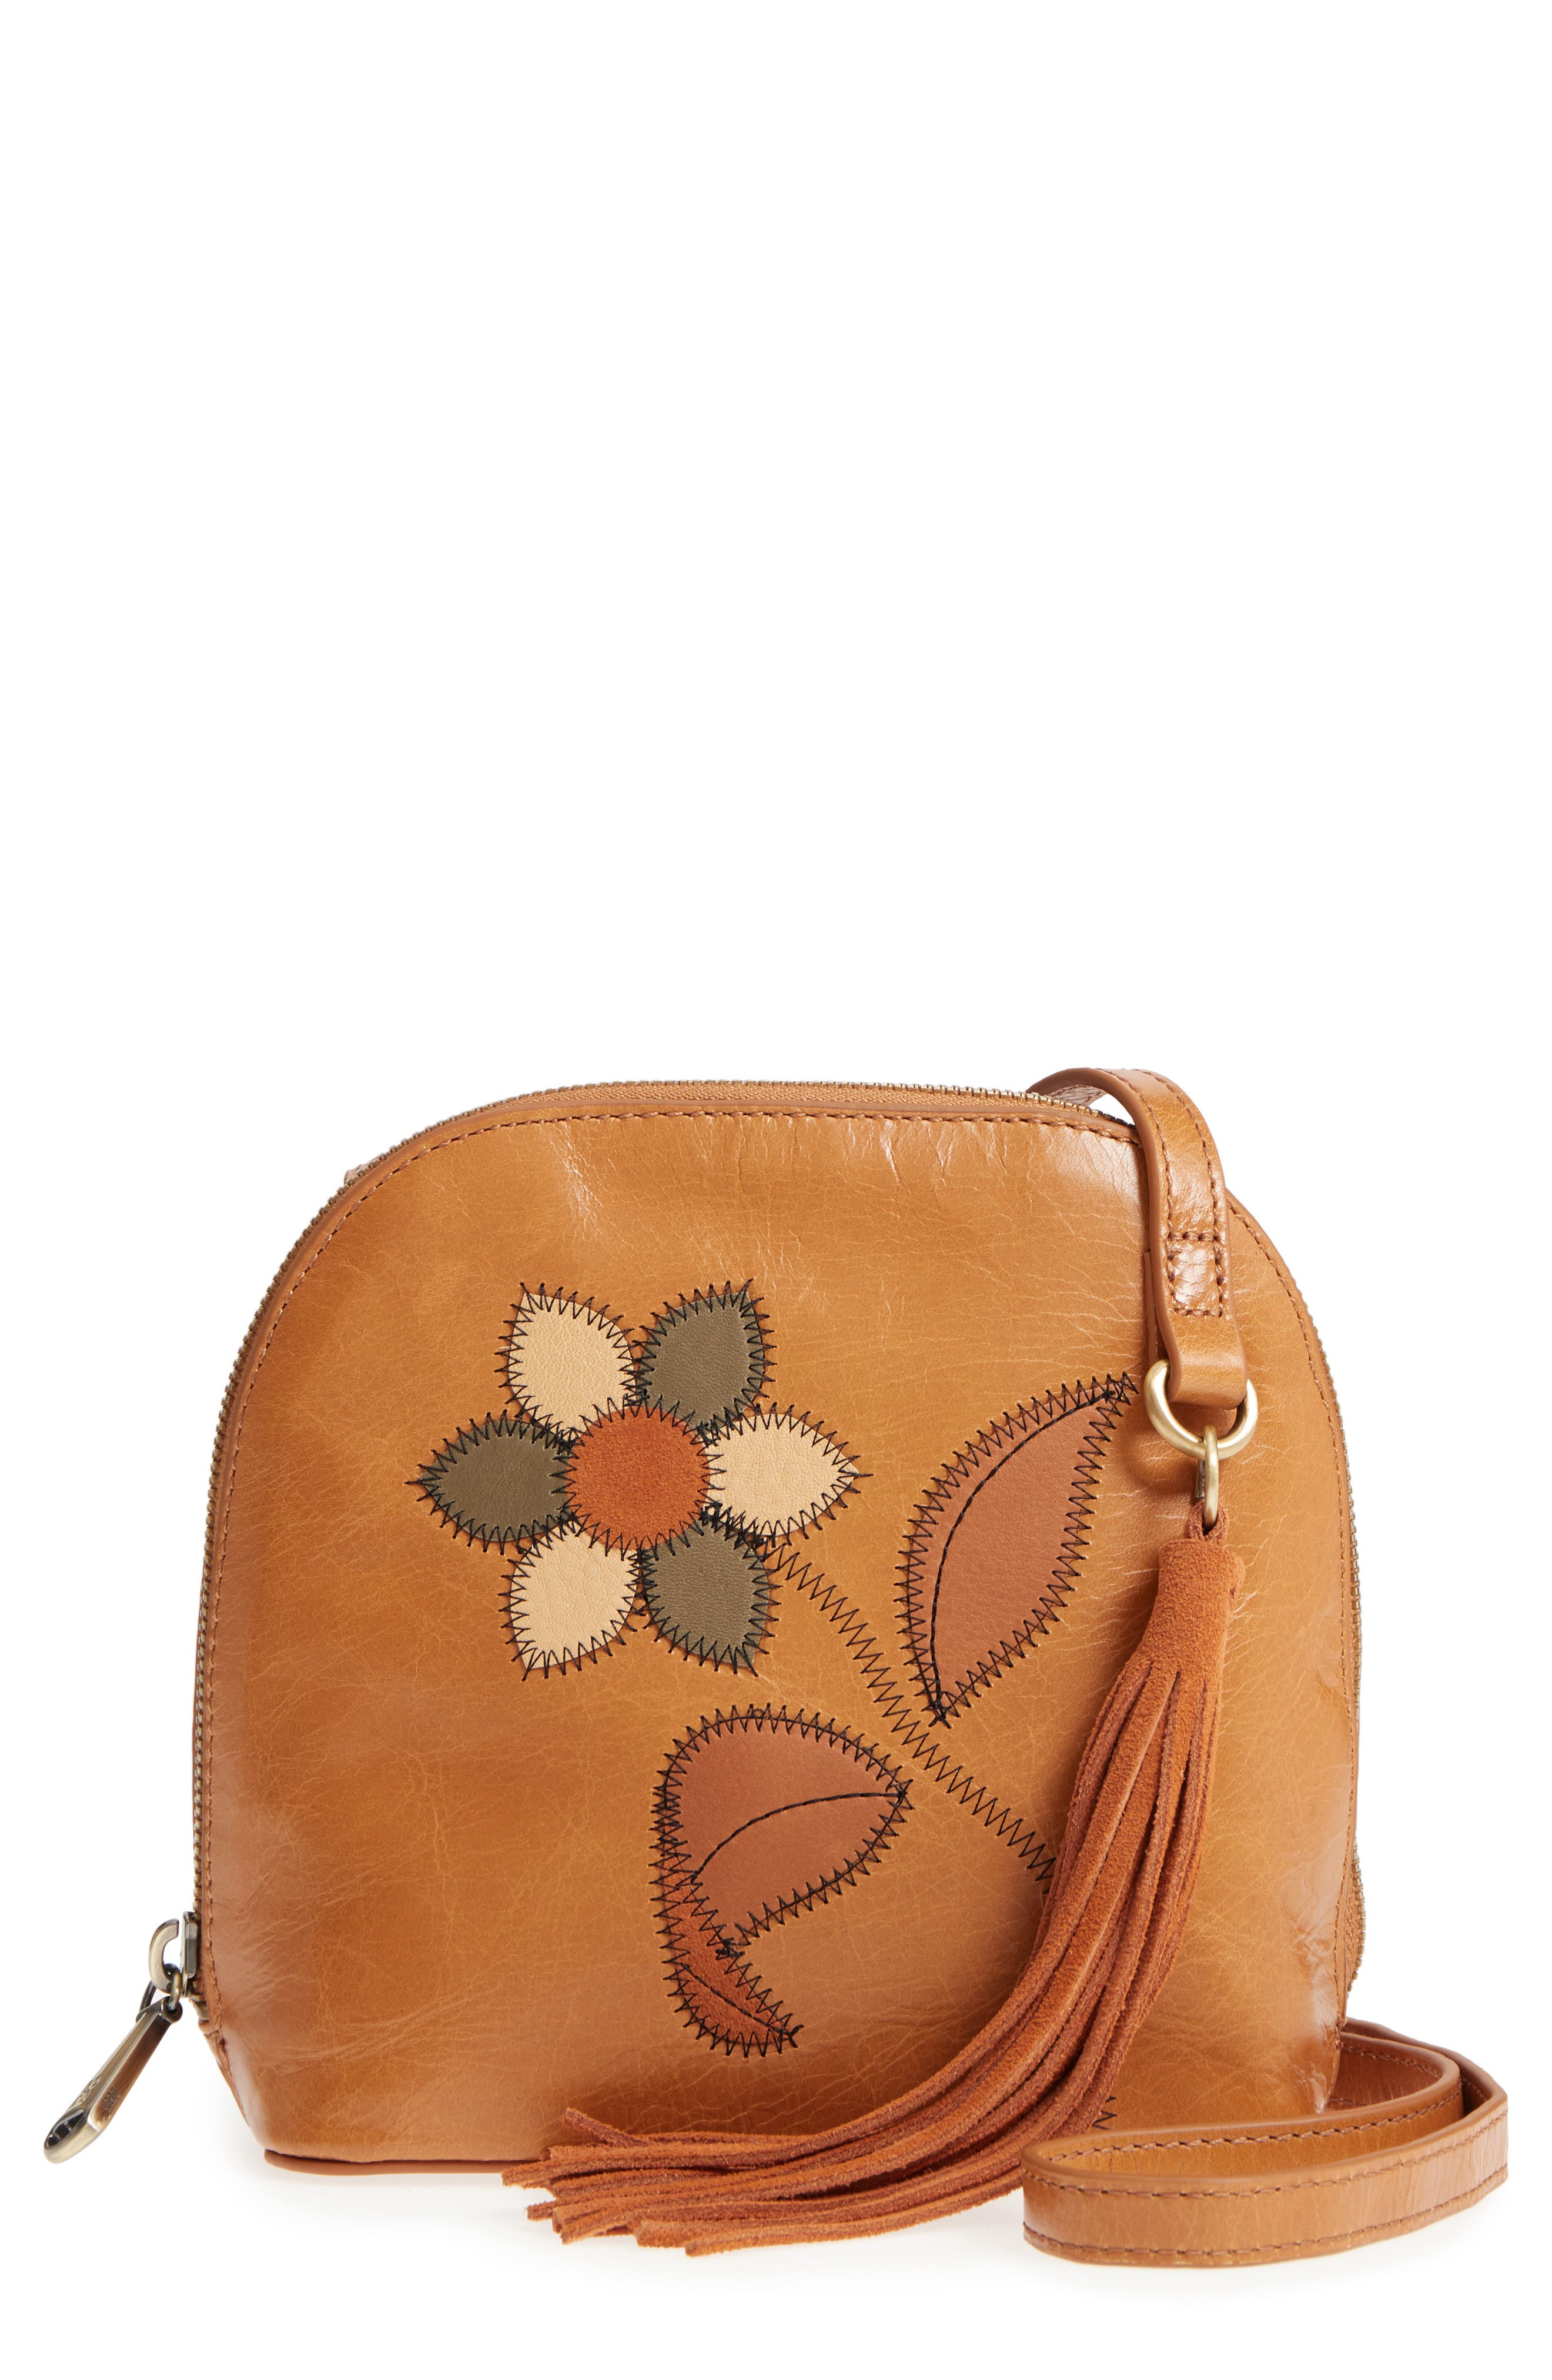 HOBO,                             Nash Floral Crossbody Bag,                             Main thumbnail 1, color,                             212